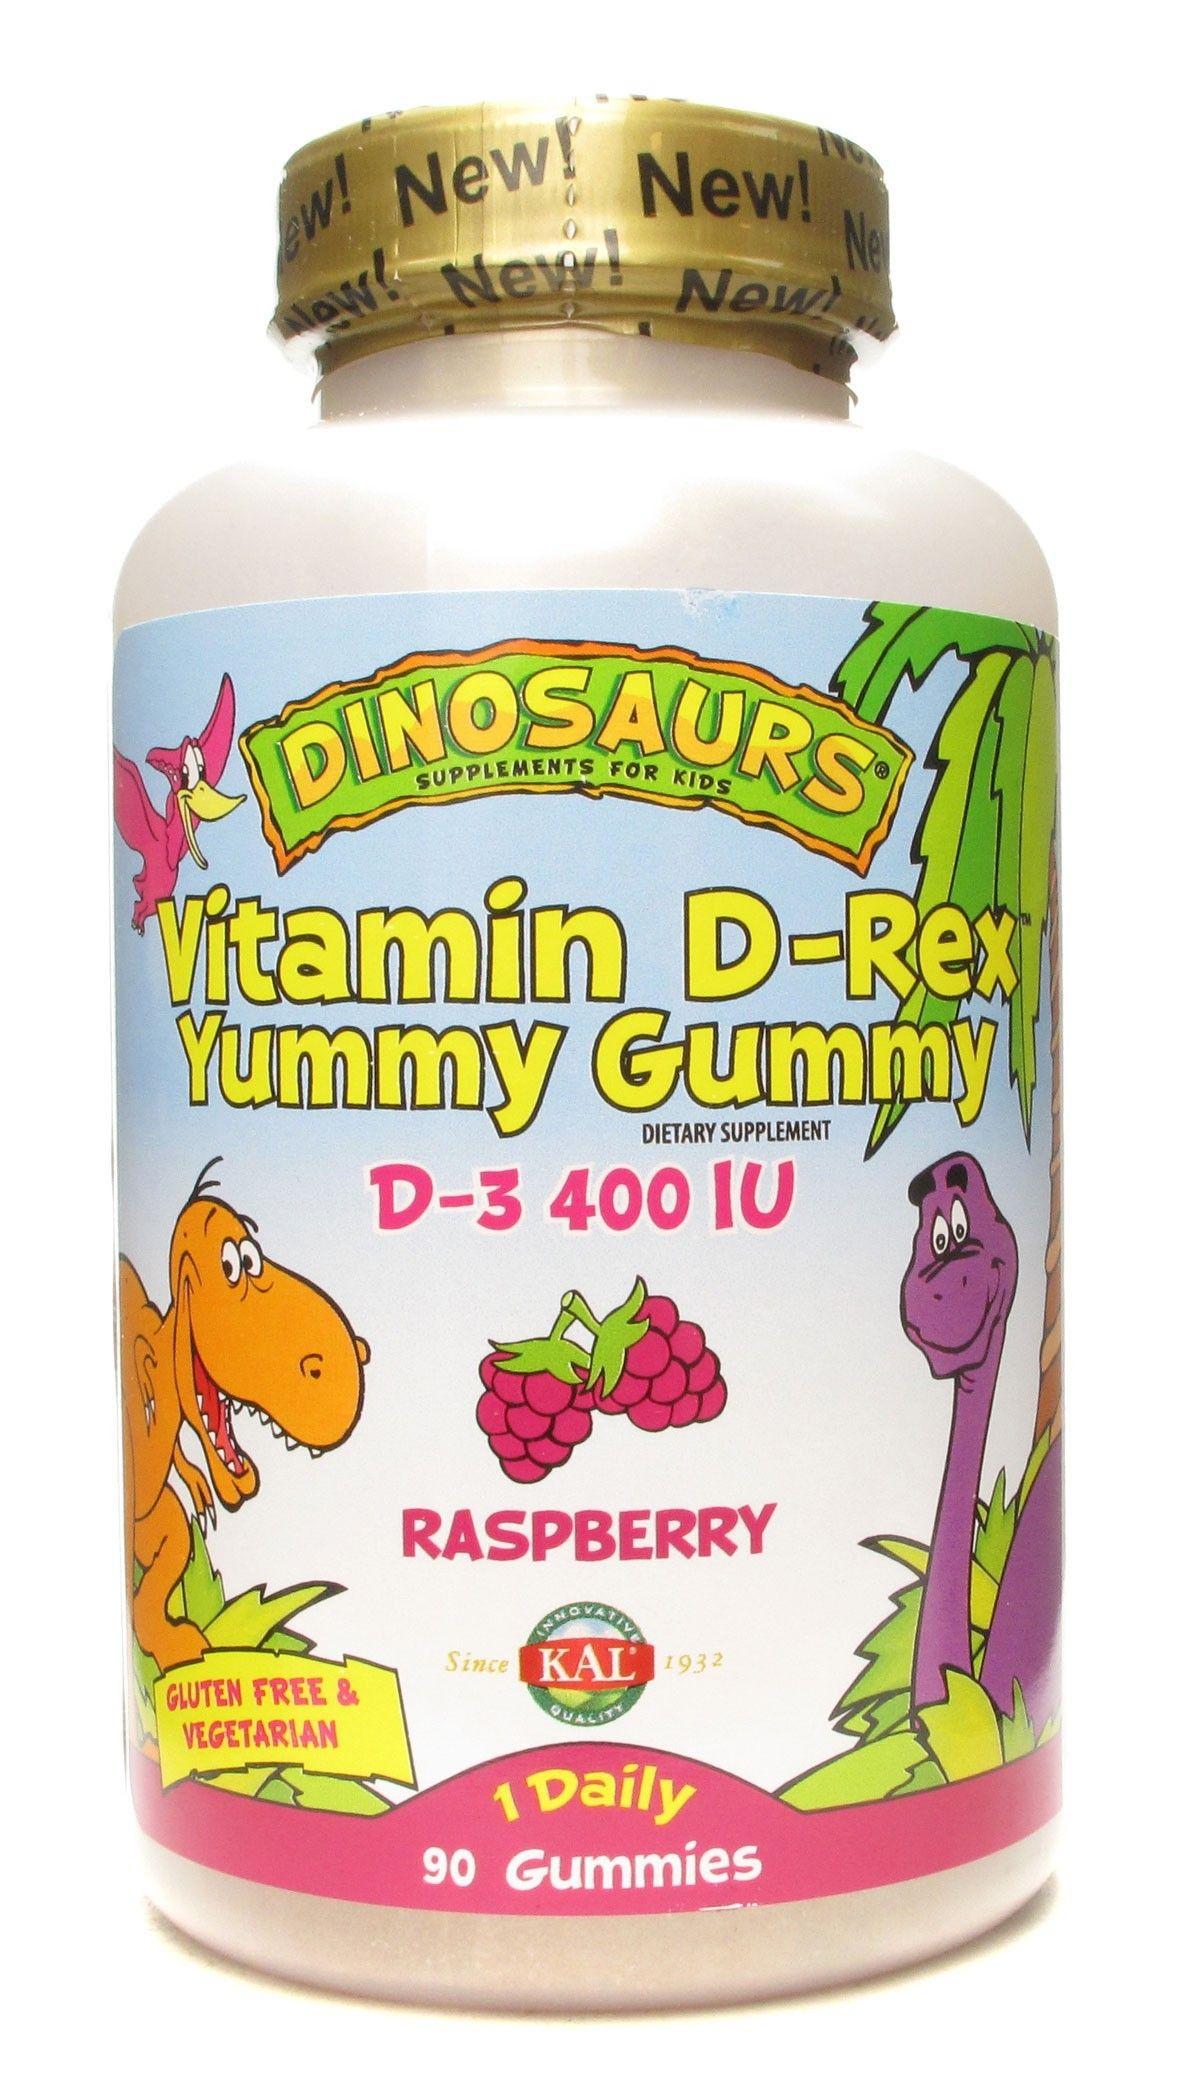 Kal vitamin drex yummy gummy raspberry 90 gummies